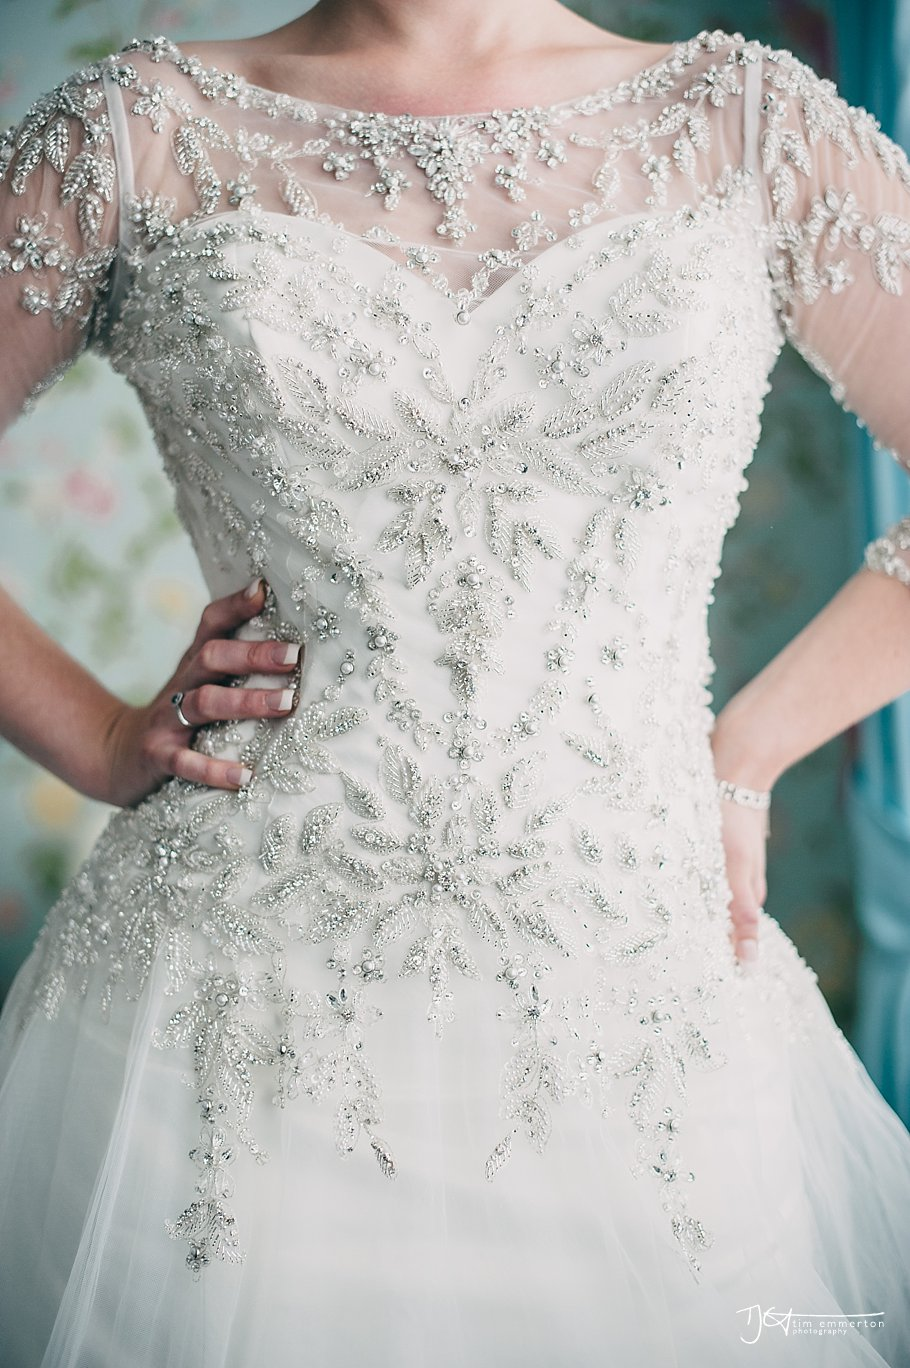 Farington-Lodge-Wedding-Photographer-025.jpg